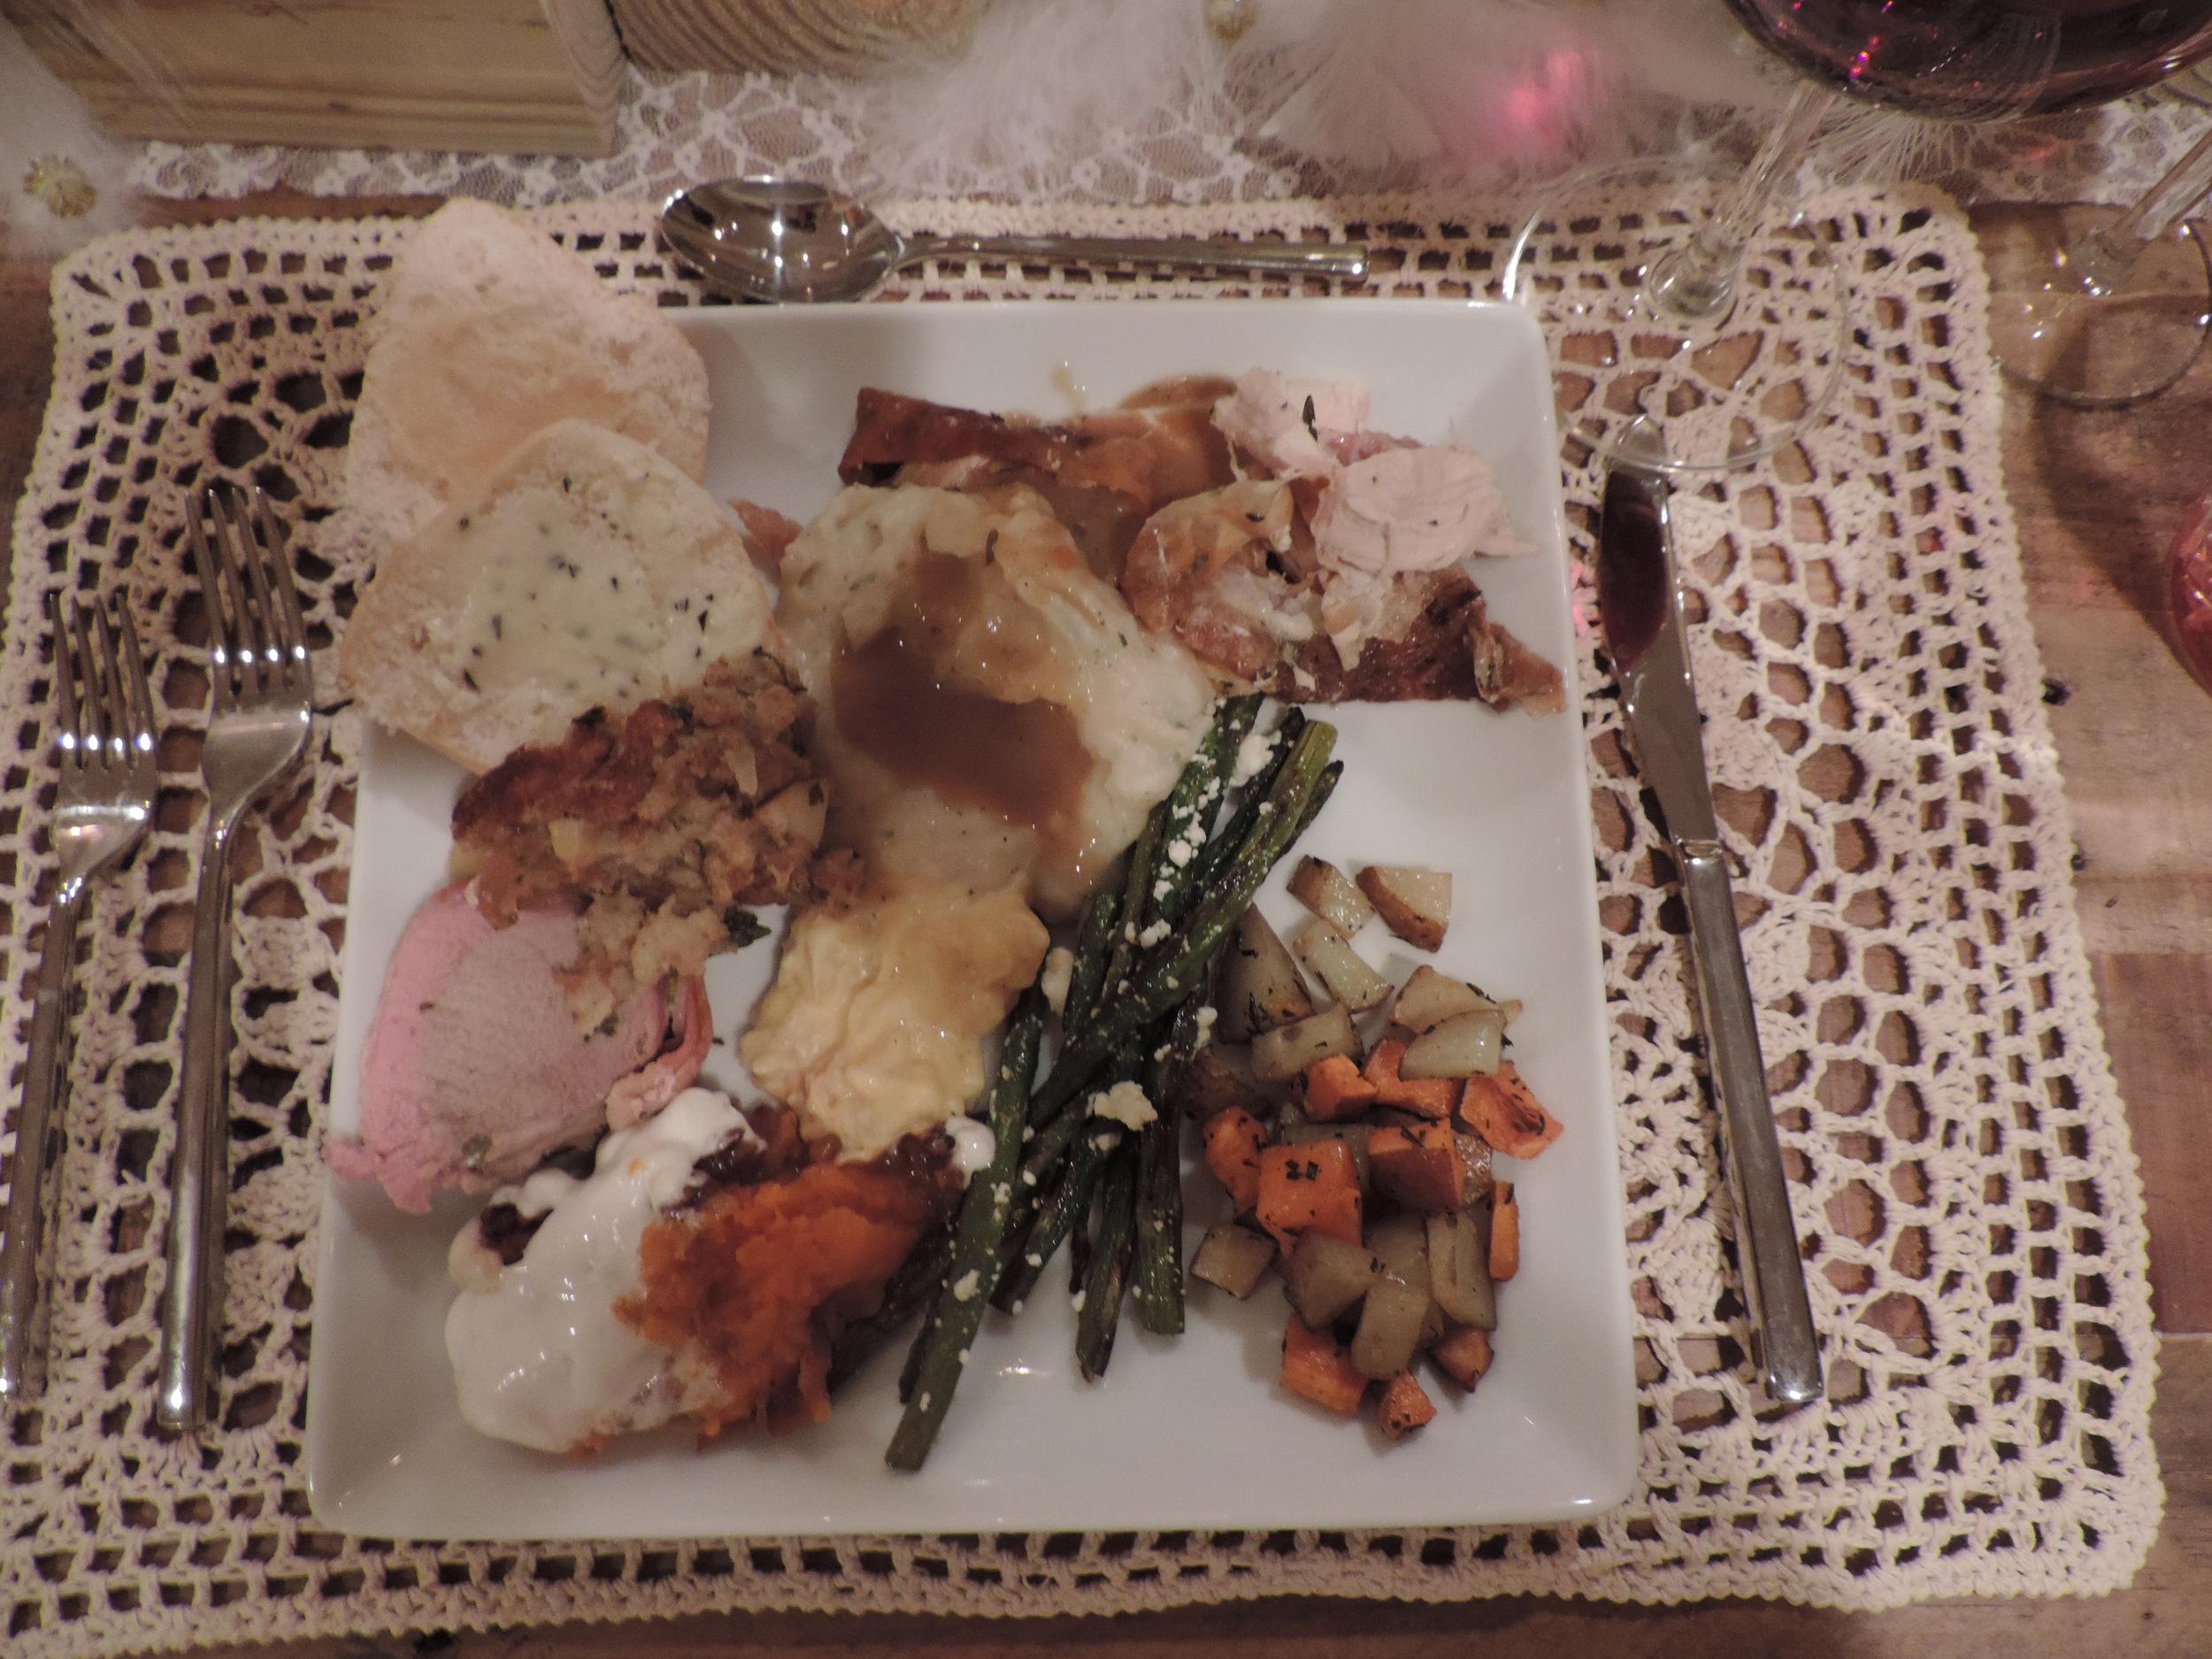 Pork Tenderloin, Turkey, Mashed Potato, Gravy, Asparagus, Roasted Potatoes, Candied Yams, Cheesy Hashbrowns, Rolls with Homemade Rosemary Lemon Butter!